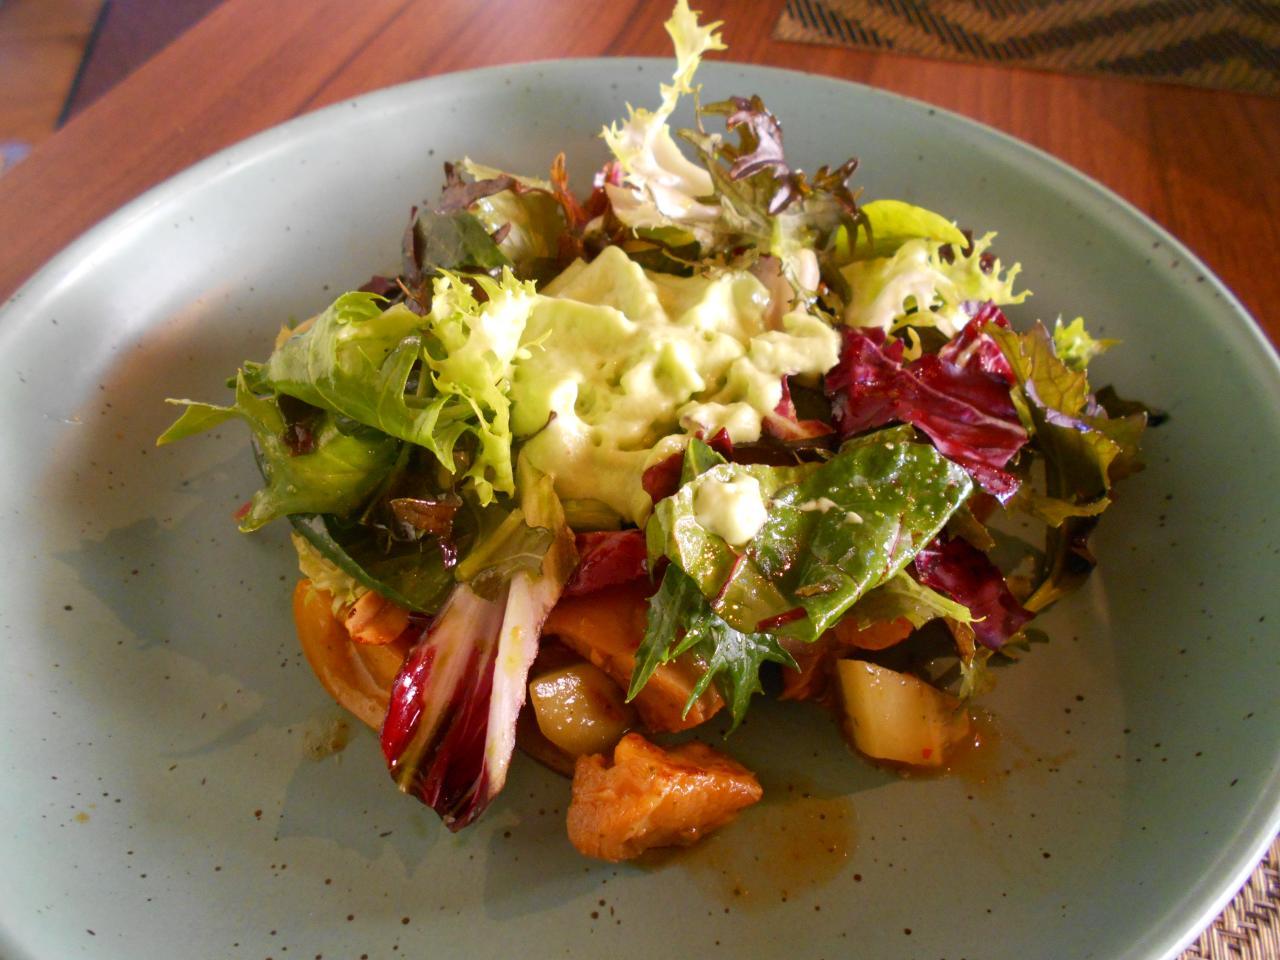 The stir-fried Thai chicken salad at Dmenú was worth a 10